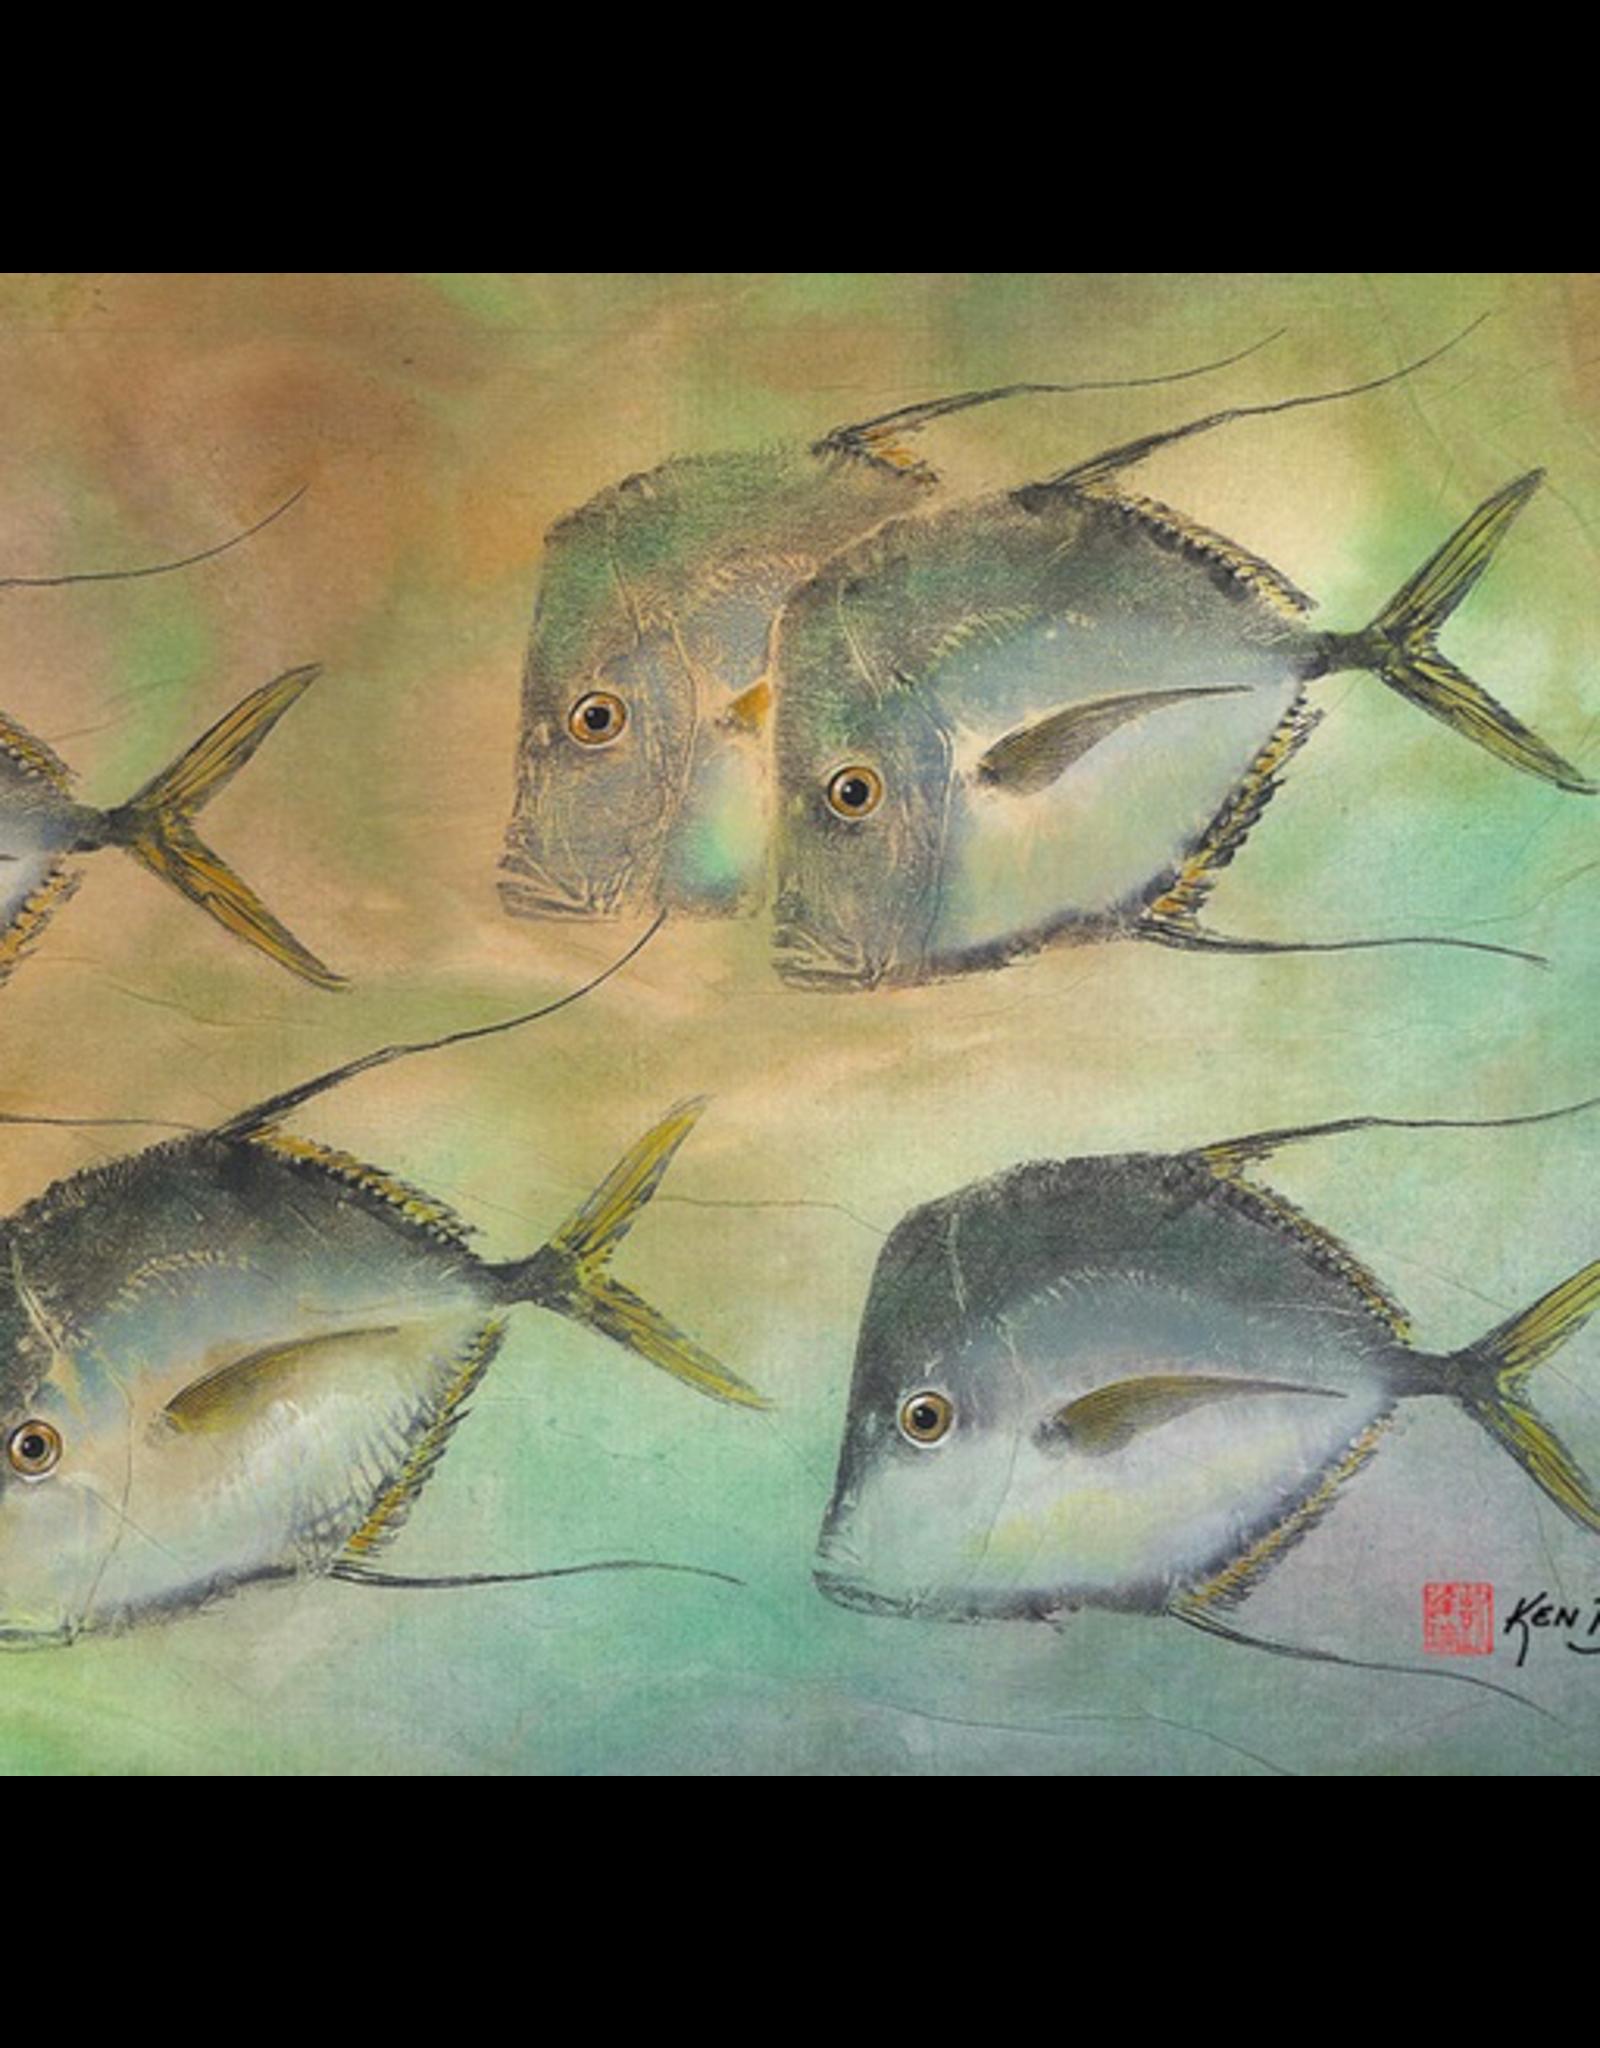 Ken Dara SINGLE FISH PRINT (Gyotaku, Asstd., 8x10 Frame, KEND)